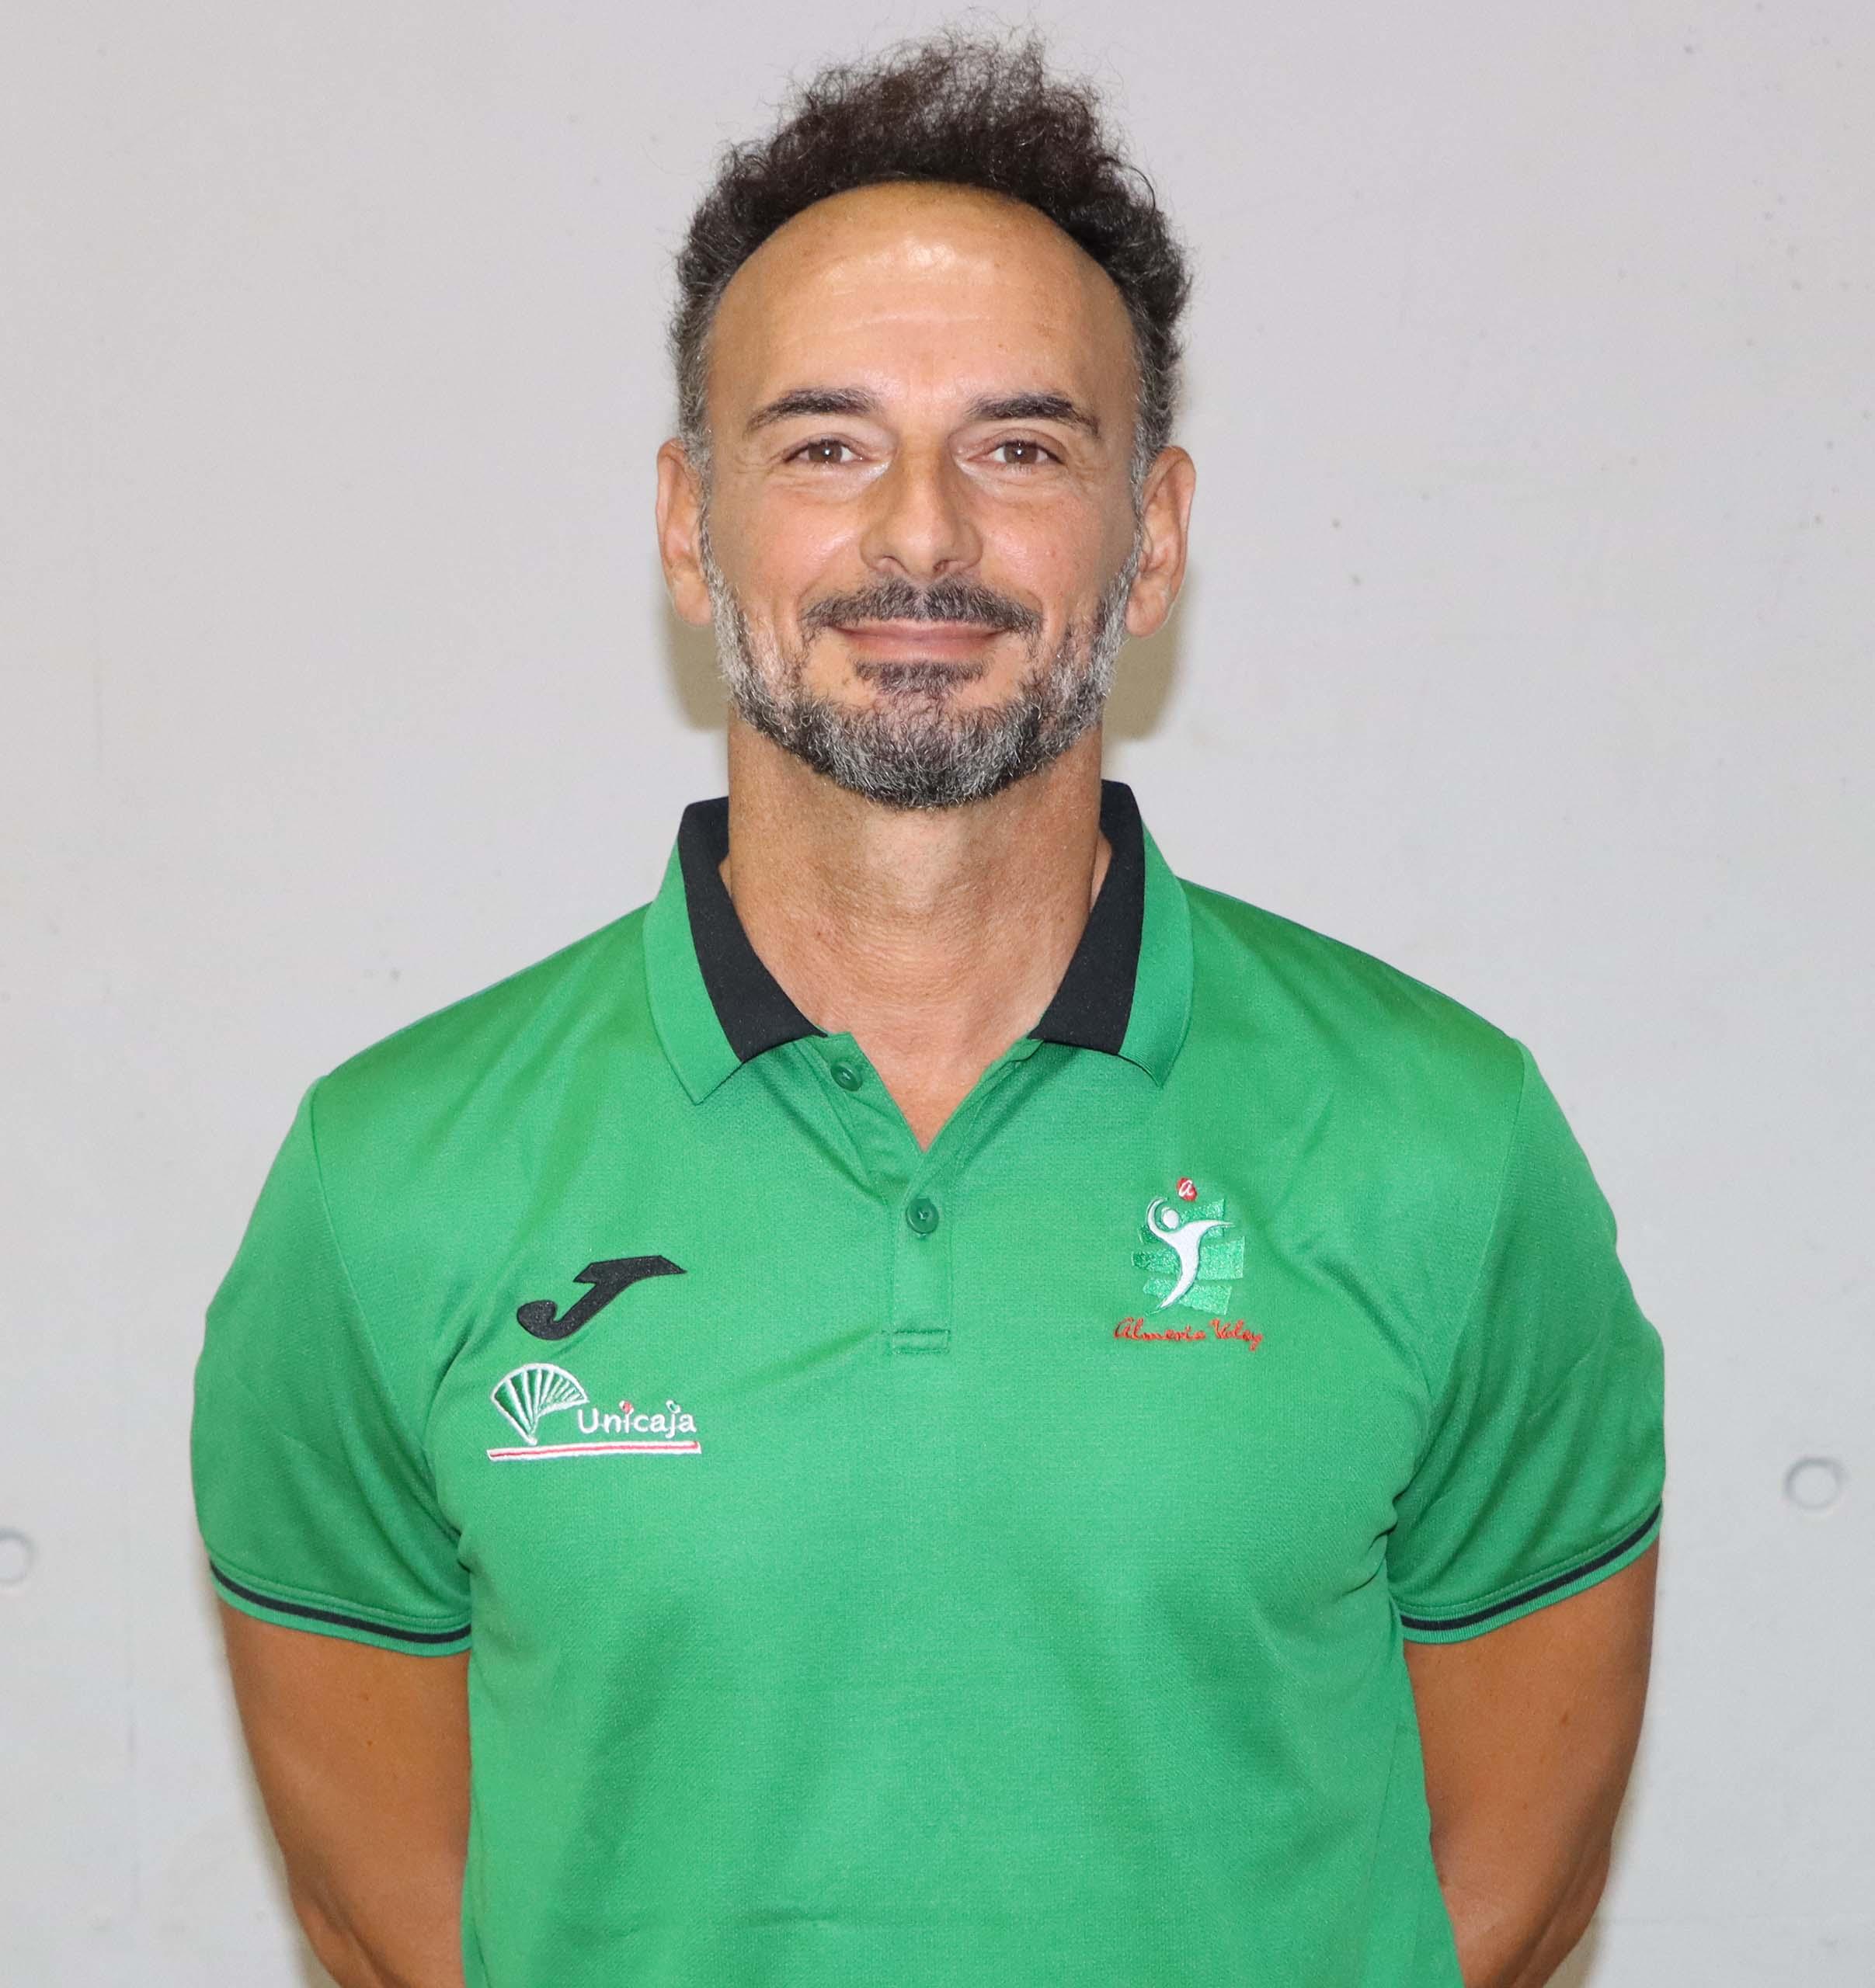 Manolo Berenguel